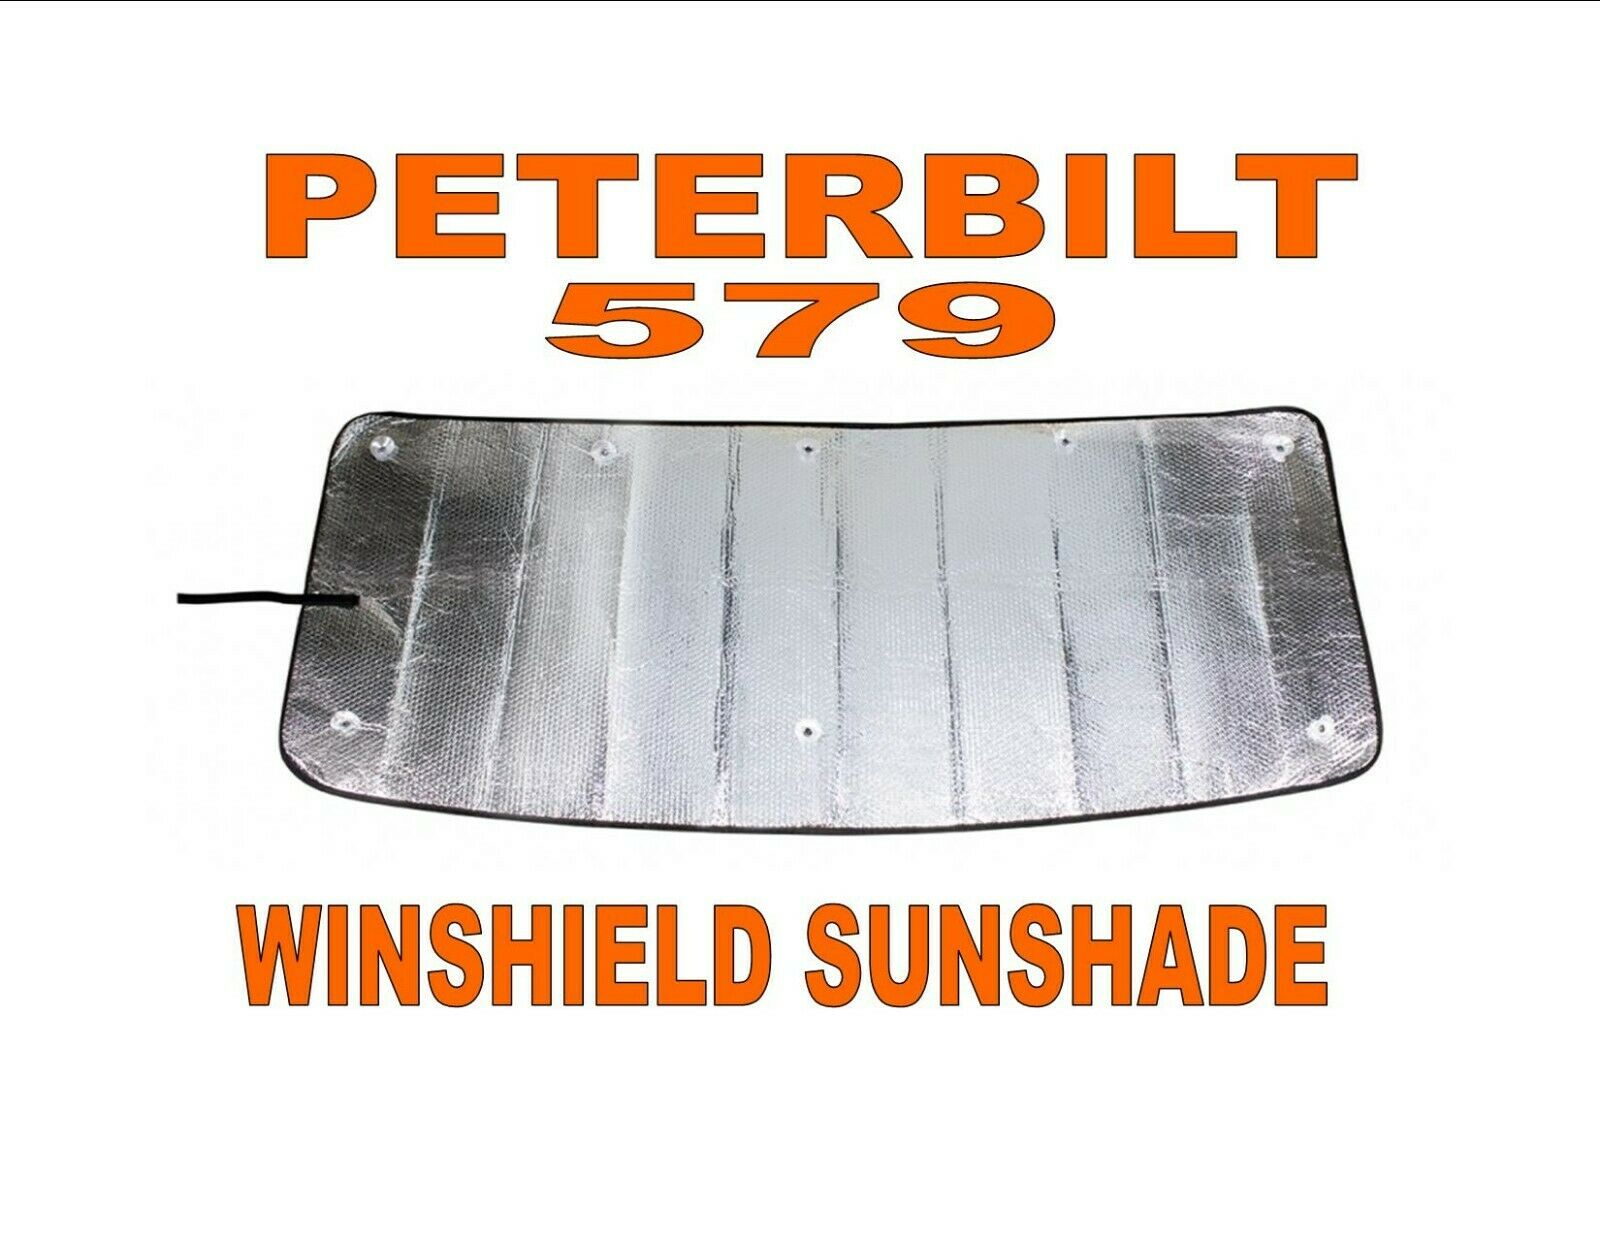 Peterbilt 579 Windshield Sunshade (2008-2019)